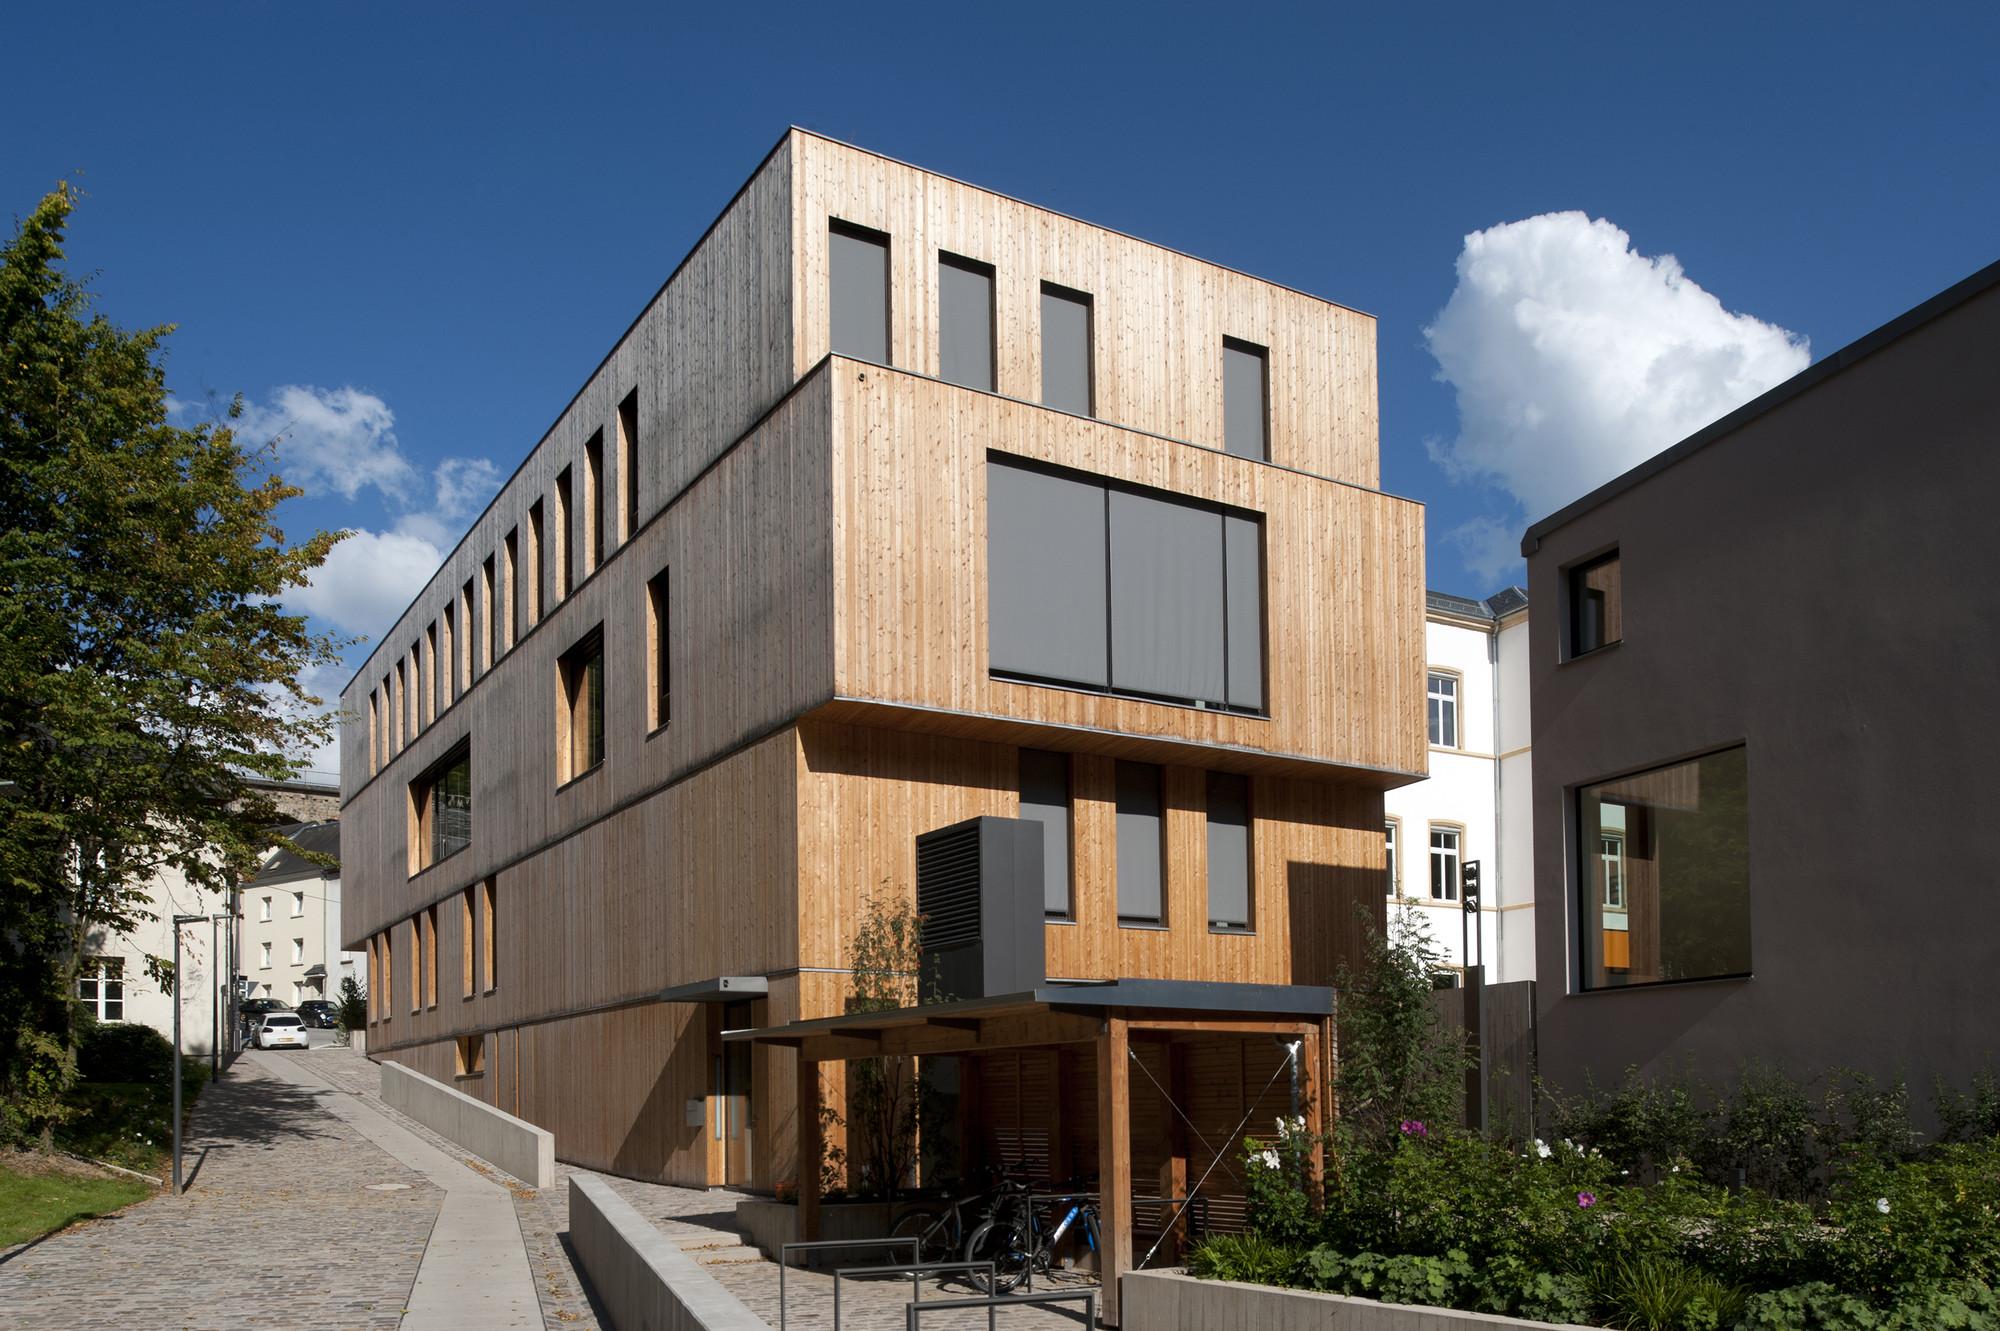 Administrative Building For The Oeko-Center / STEINMETZDEMEYER, © Catherine Thiry